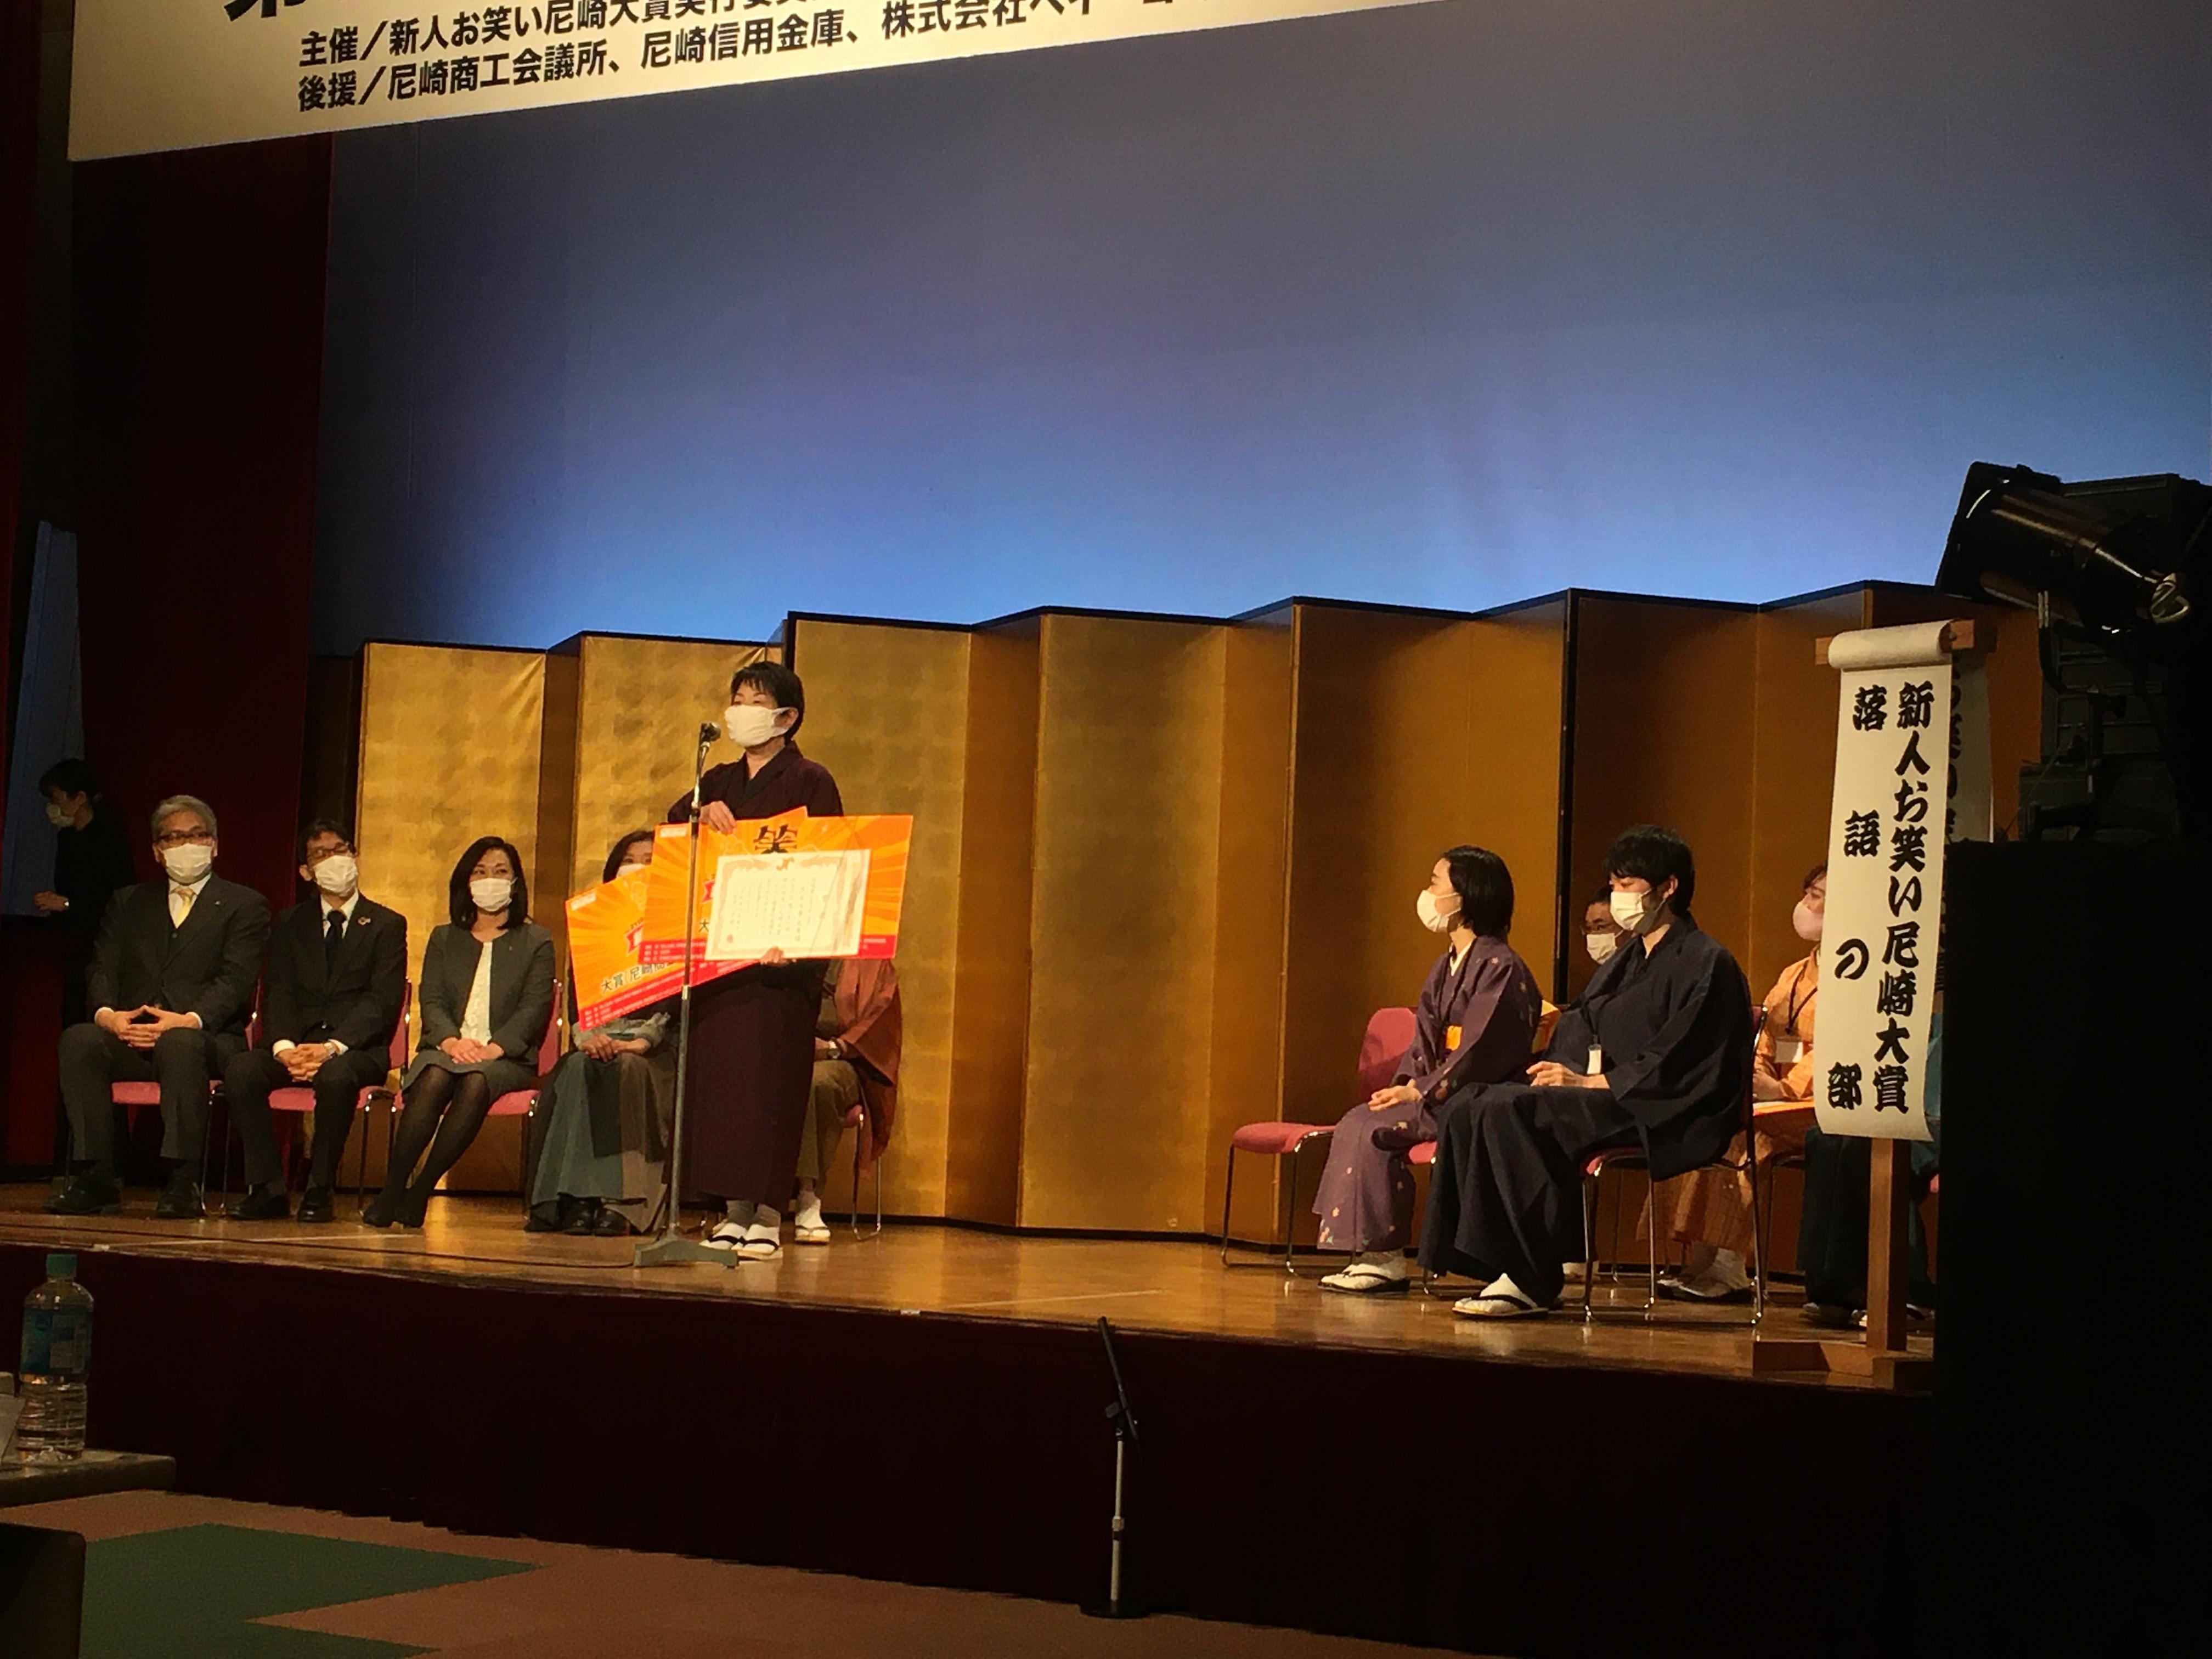 第21回新人お笑い尼崎大賞落語部門